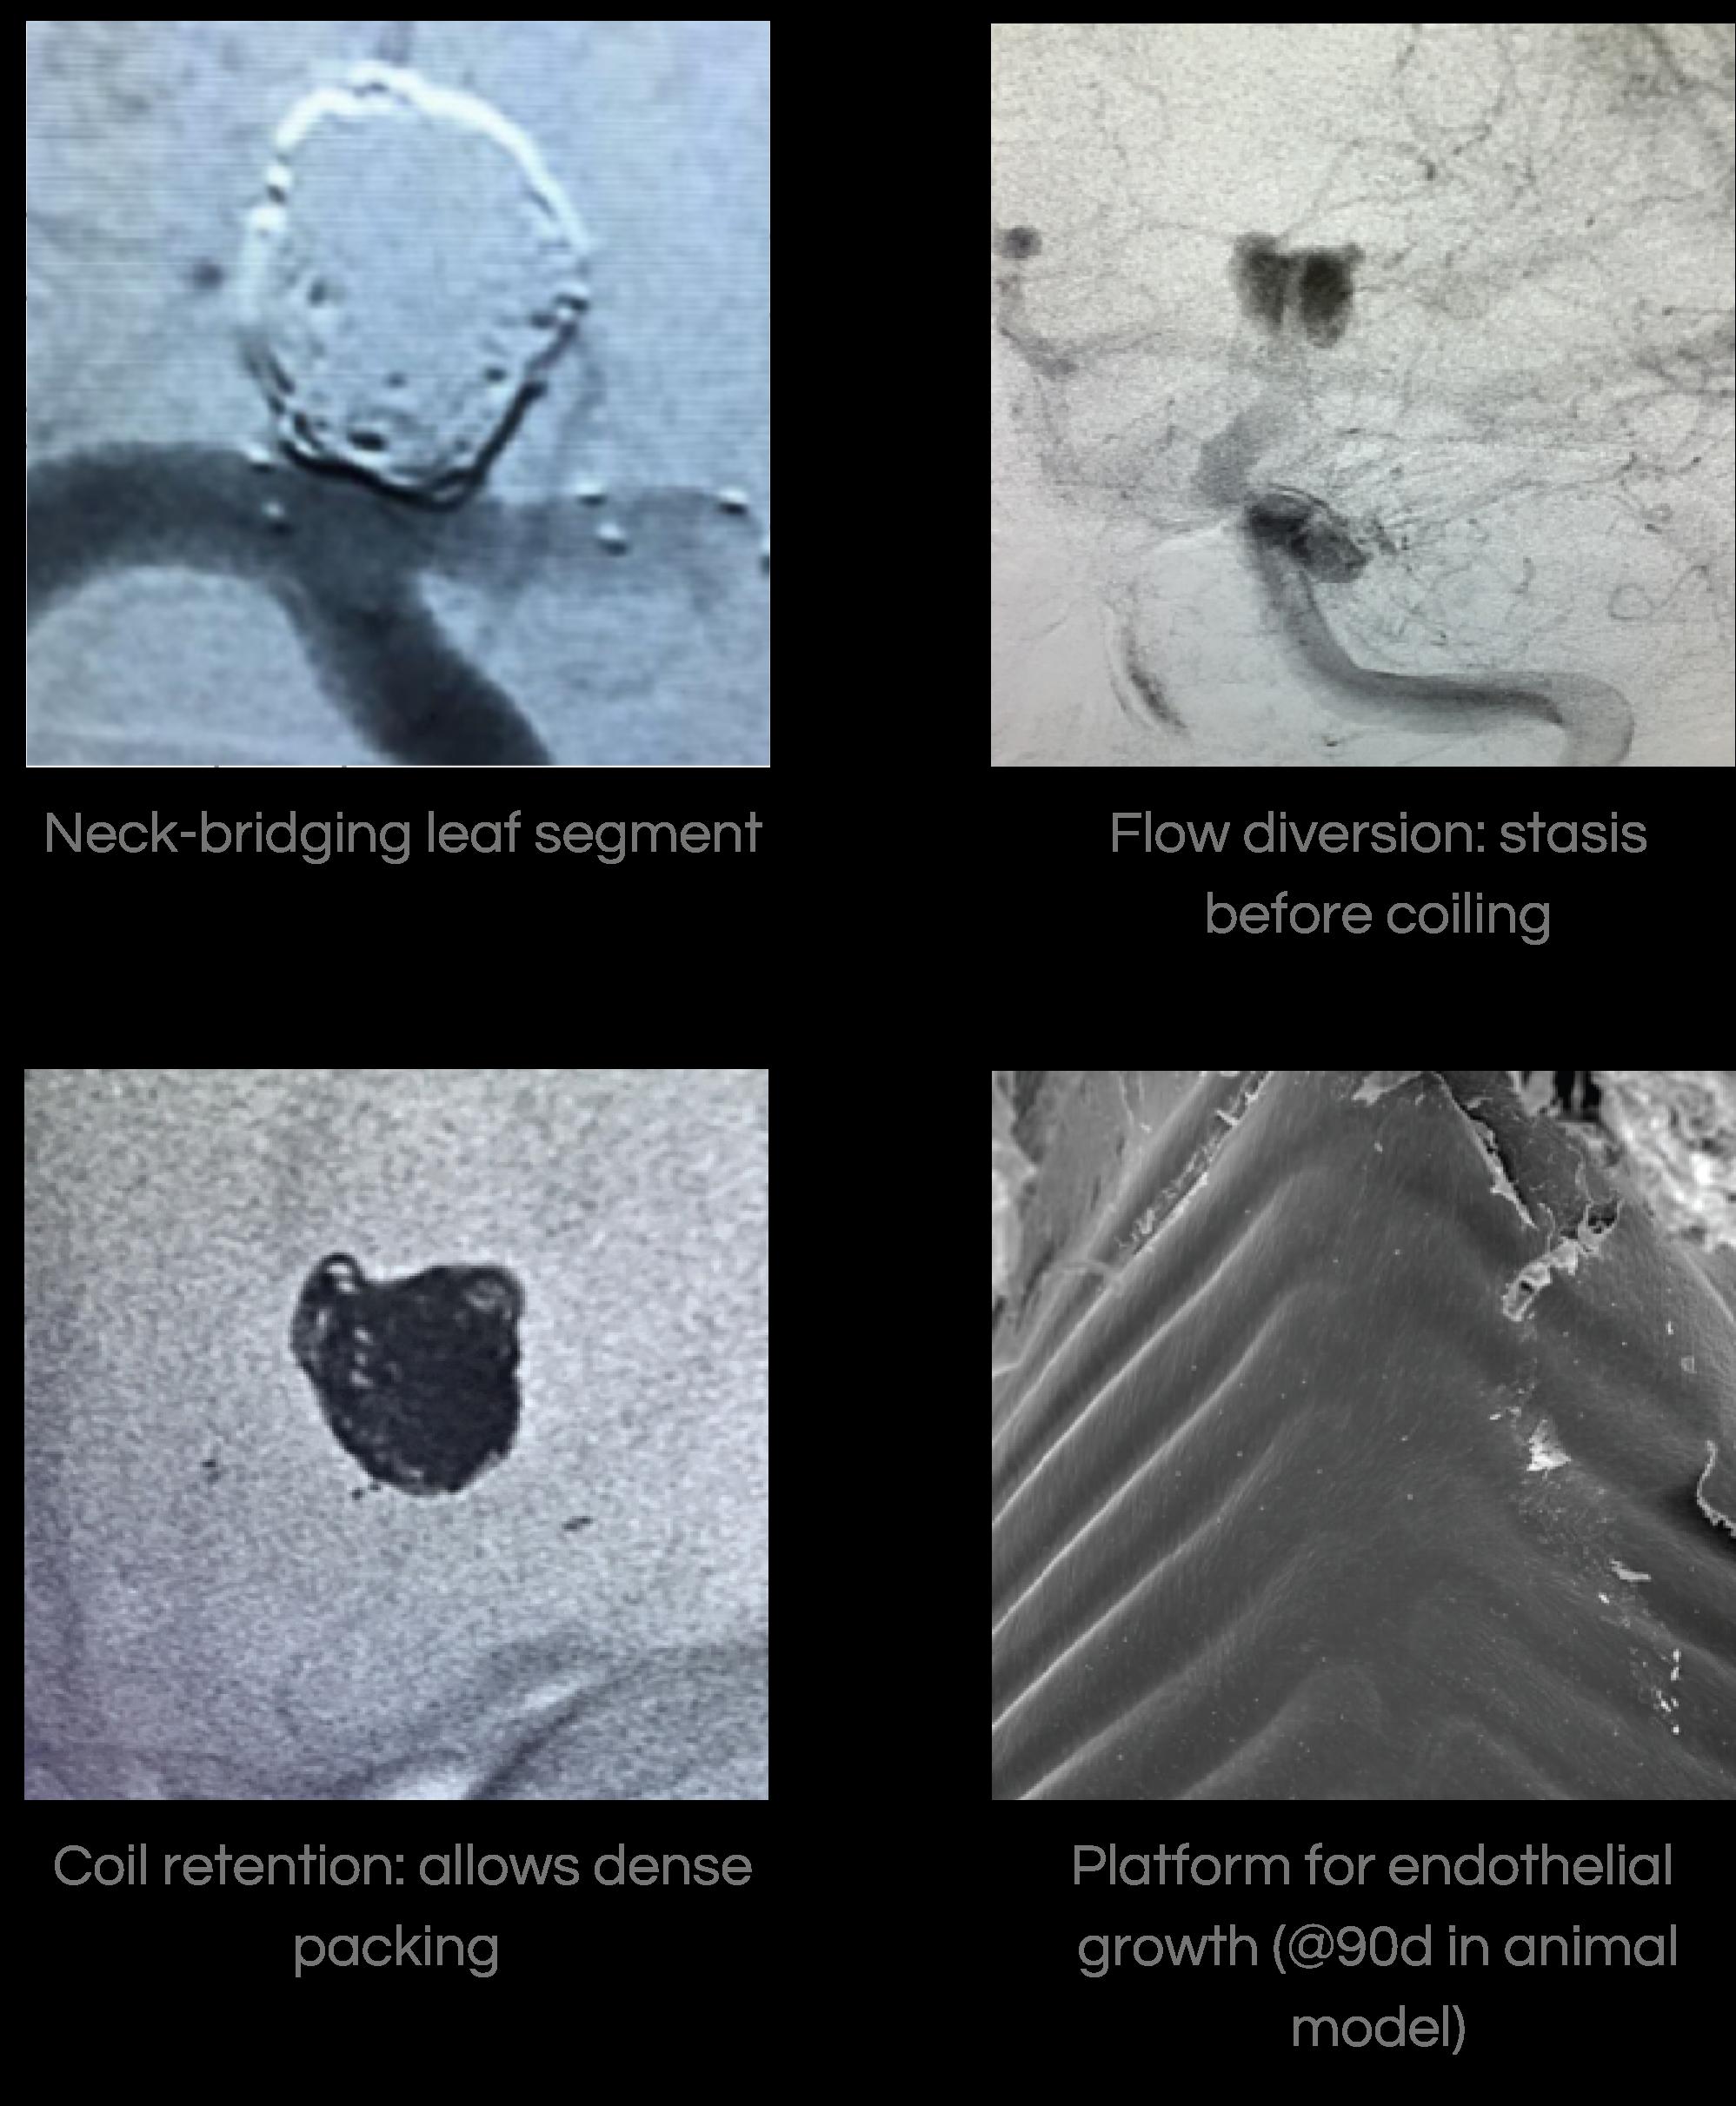 Four images showing neck-bridging leaf segment, coil retention, flow diversion. and platform for endothelial growth.